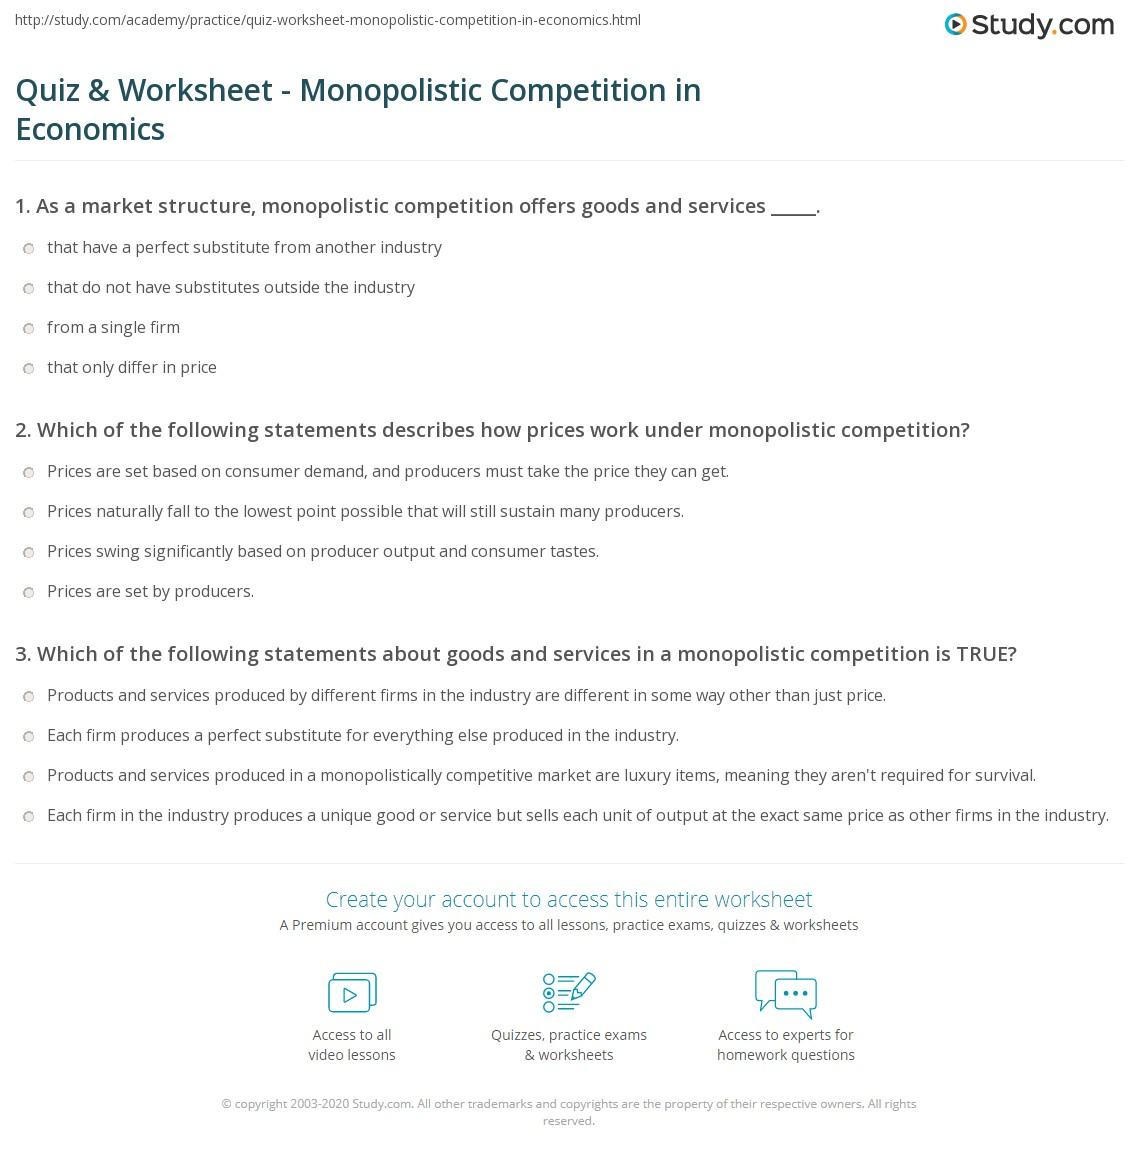 quiz worksheet monopolistic competition in economics. Black Bedroom Furniture Sets. Home Design Ideas